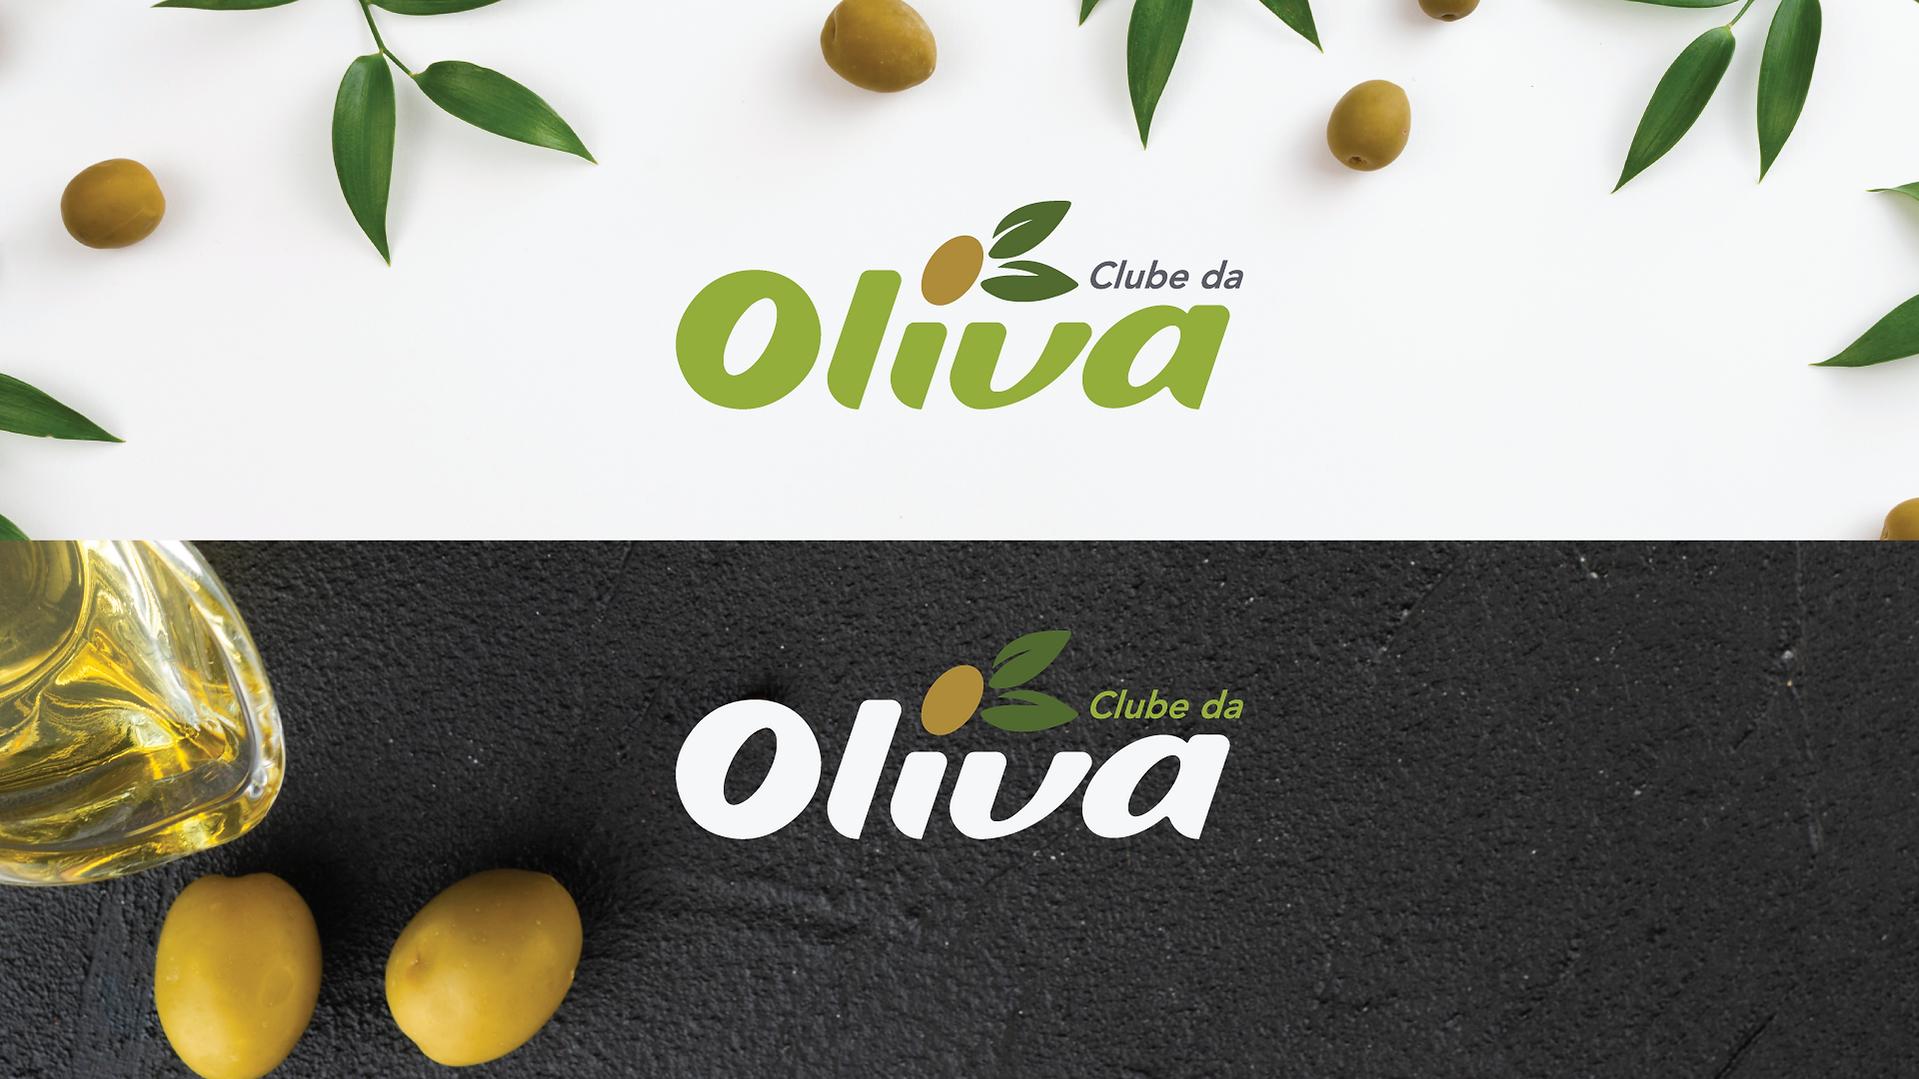 Clube da Oliva®